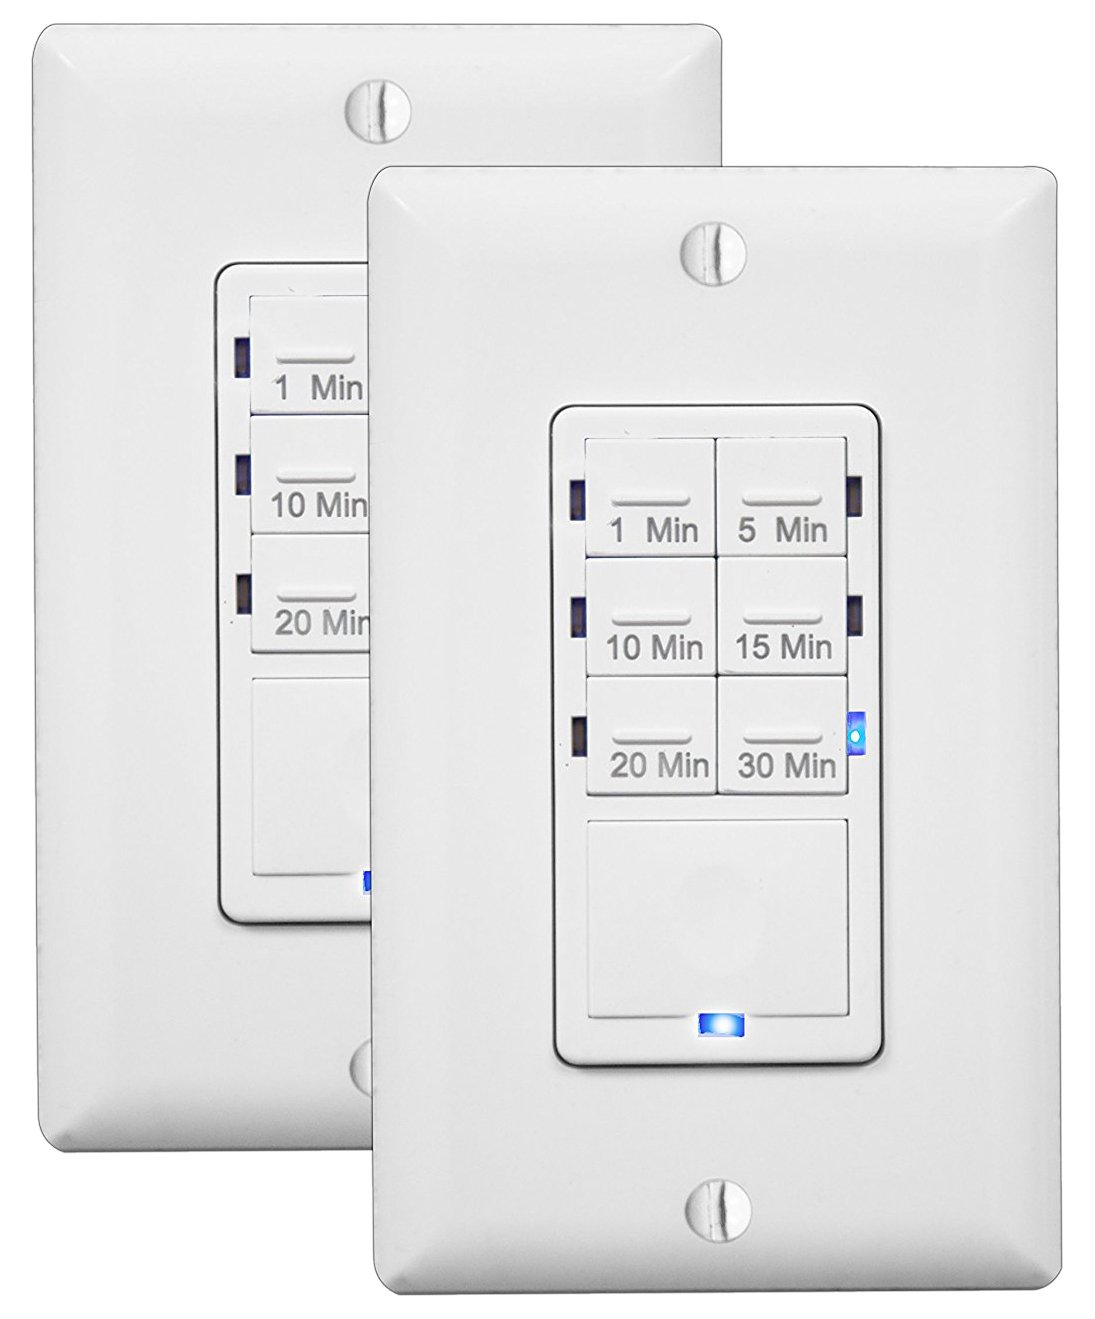 Enerlites In Wall Timer Switch Fan Countdown Wiring Bath Light Bathroom 1 30 Min Night Led Indicator